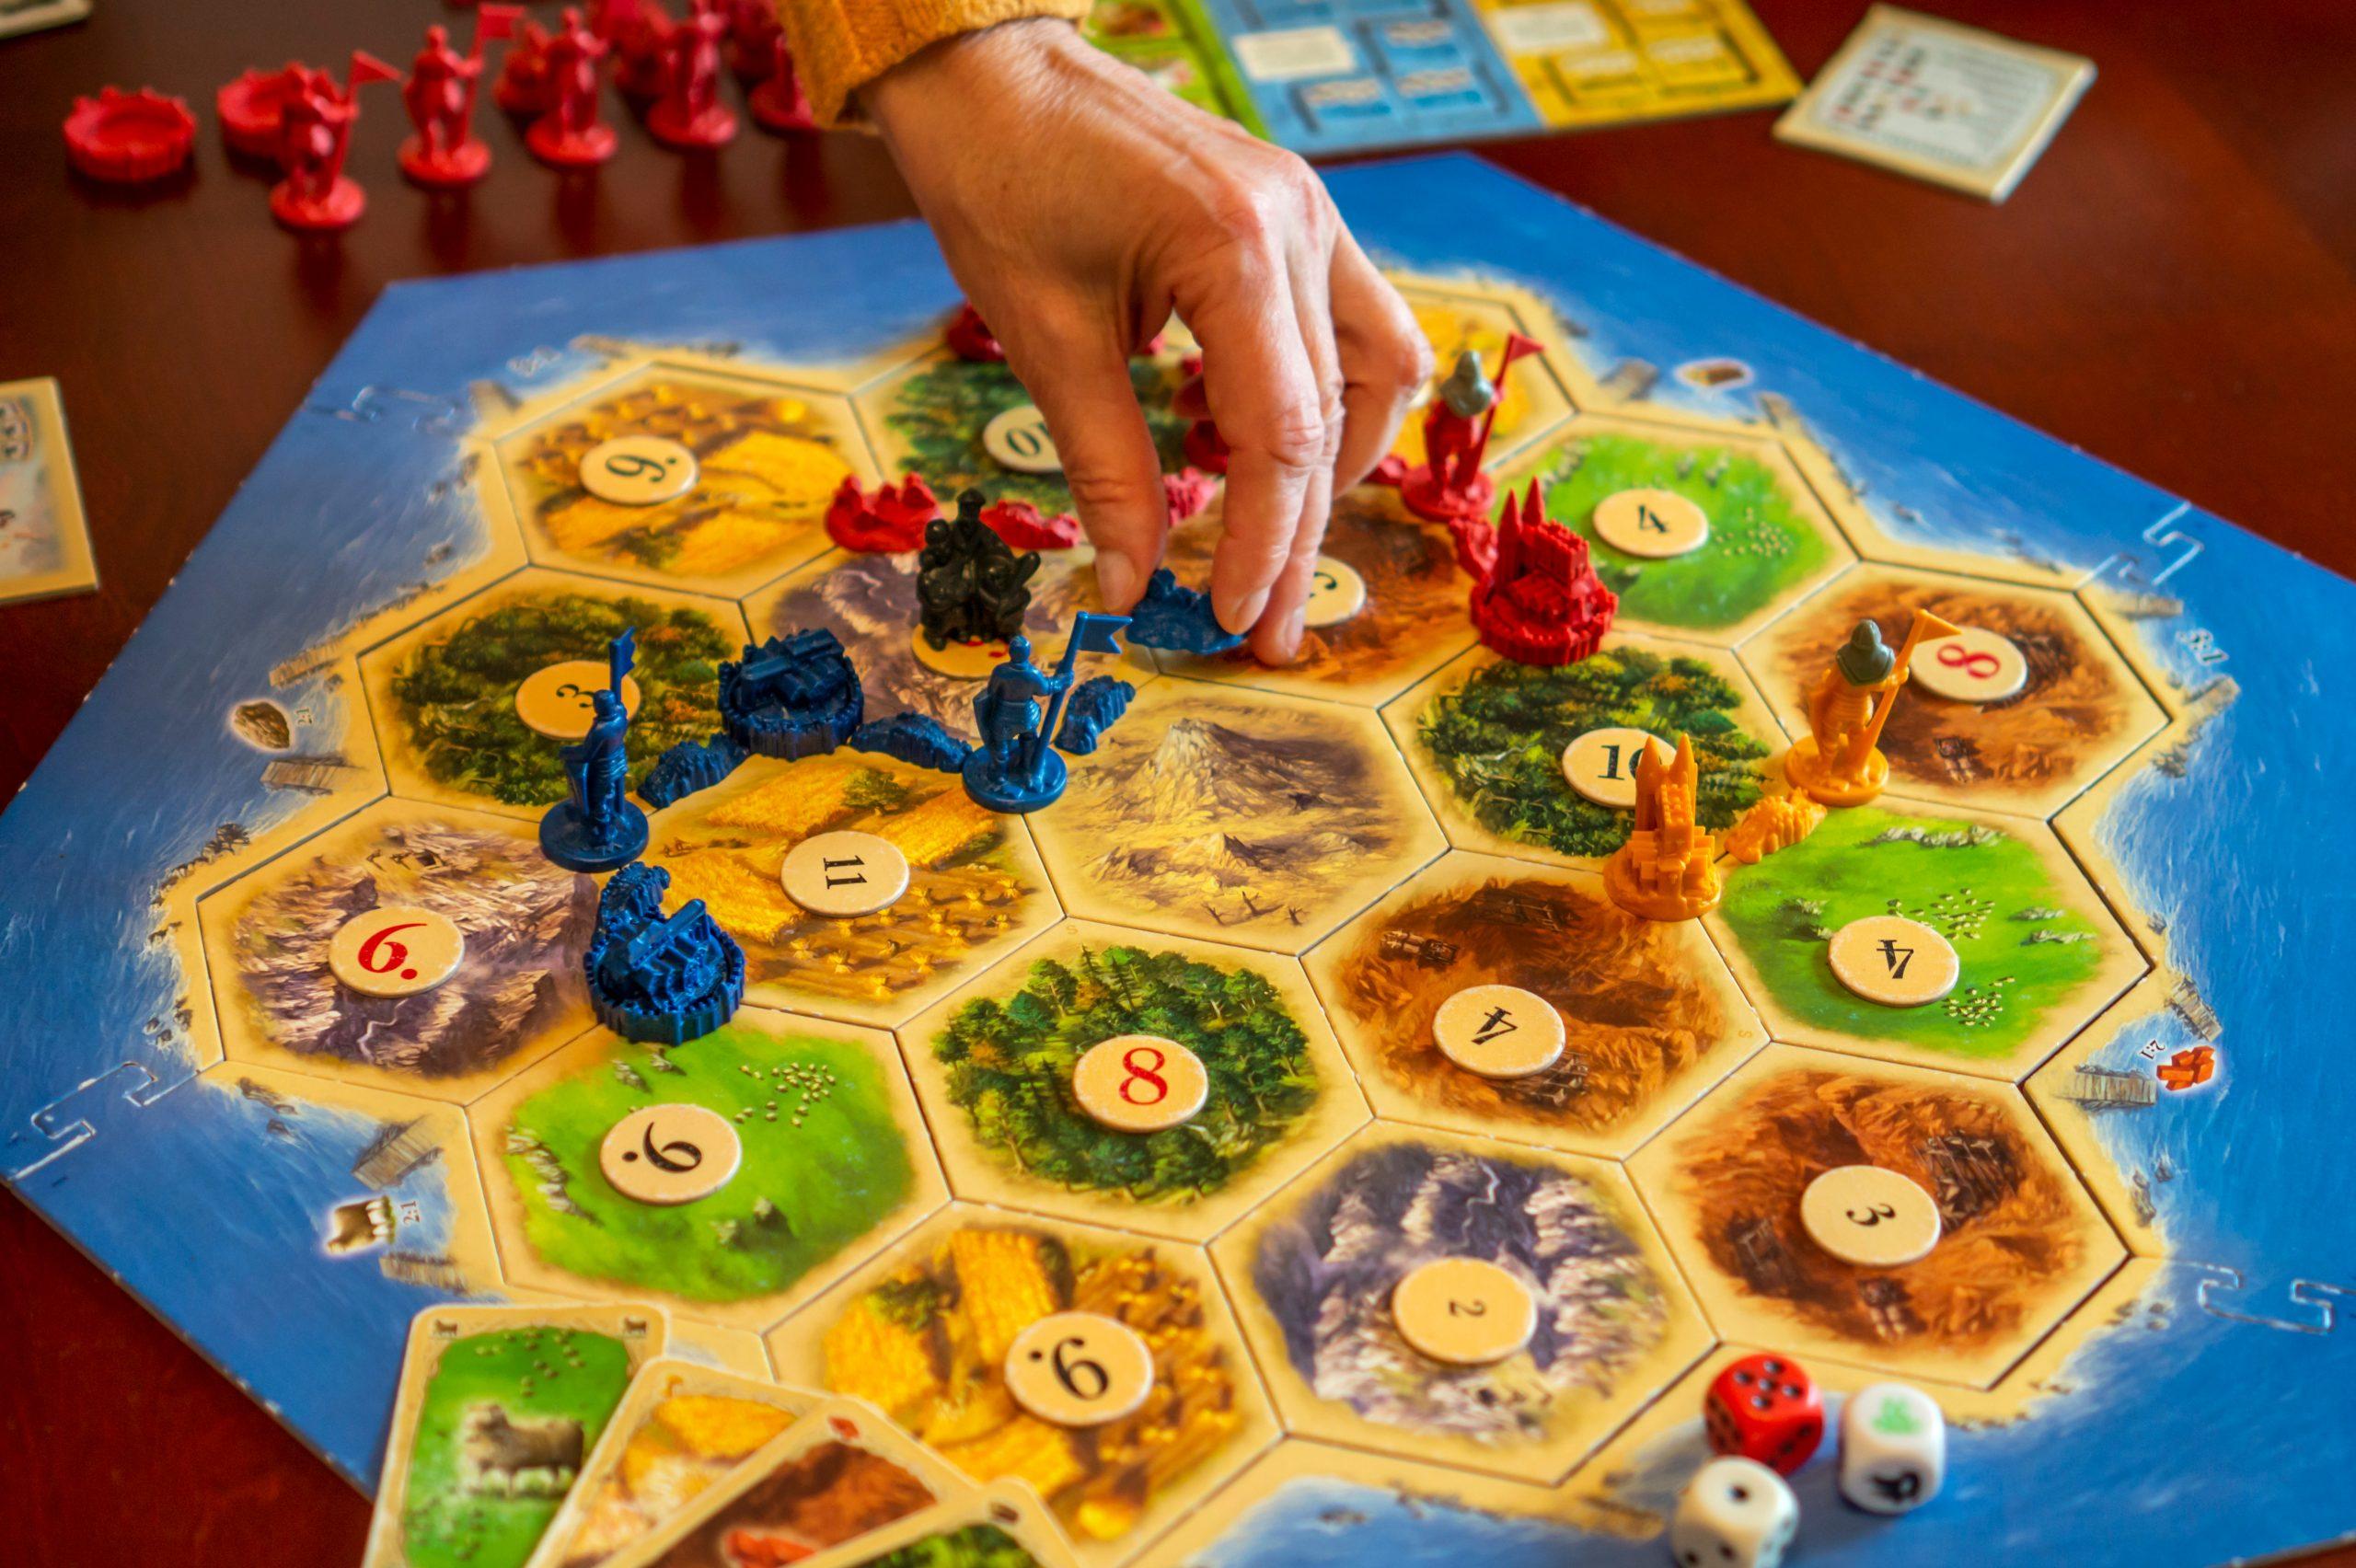 لعبة Settlers of Catan